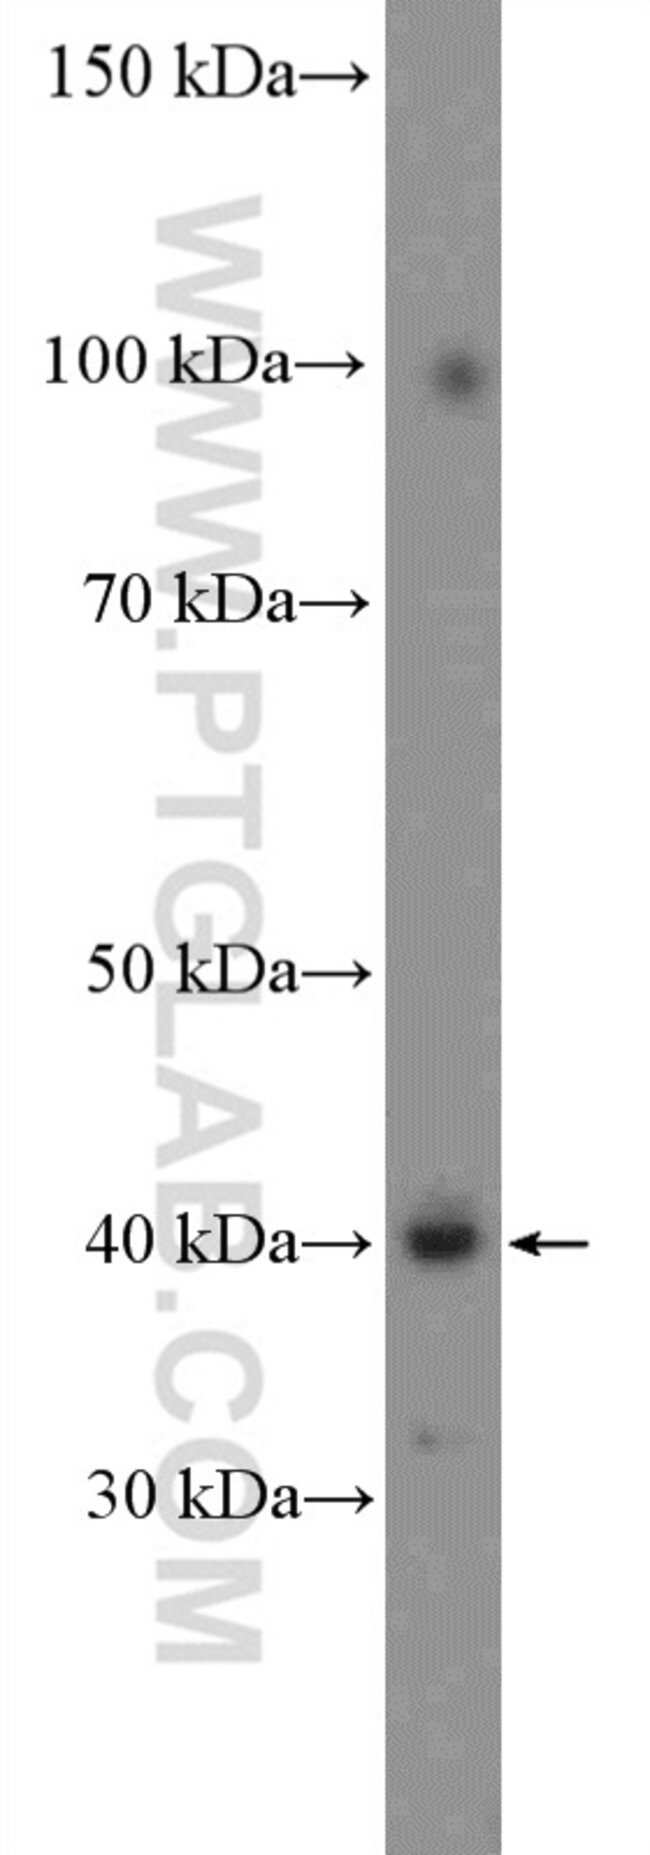 FAM131B Rabbit anti-Human, Polyclonal, Proteintech 150 μL; Unconjugated Ver productos